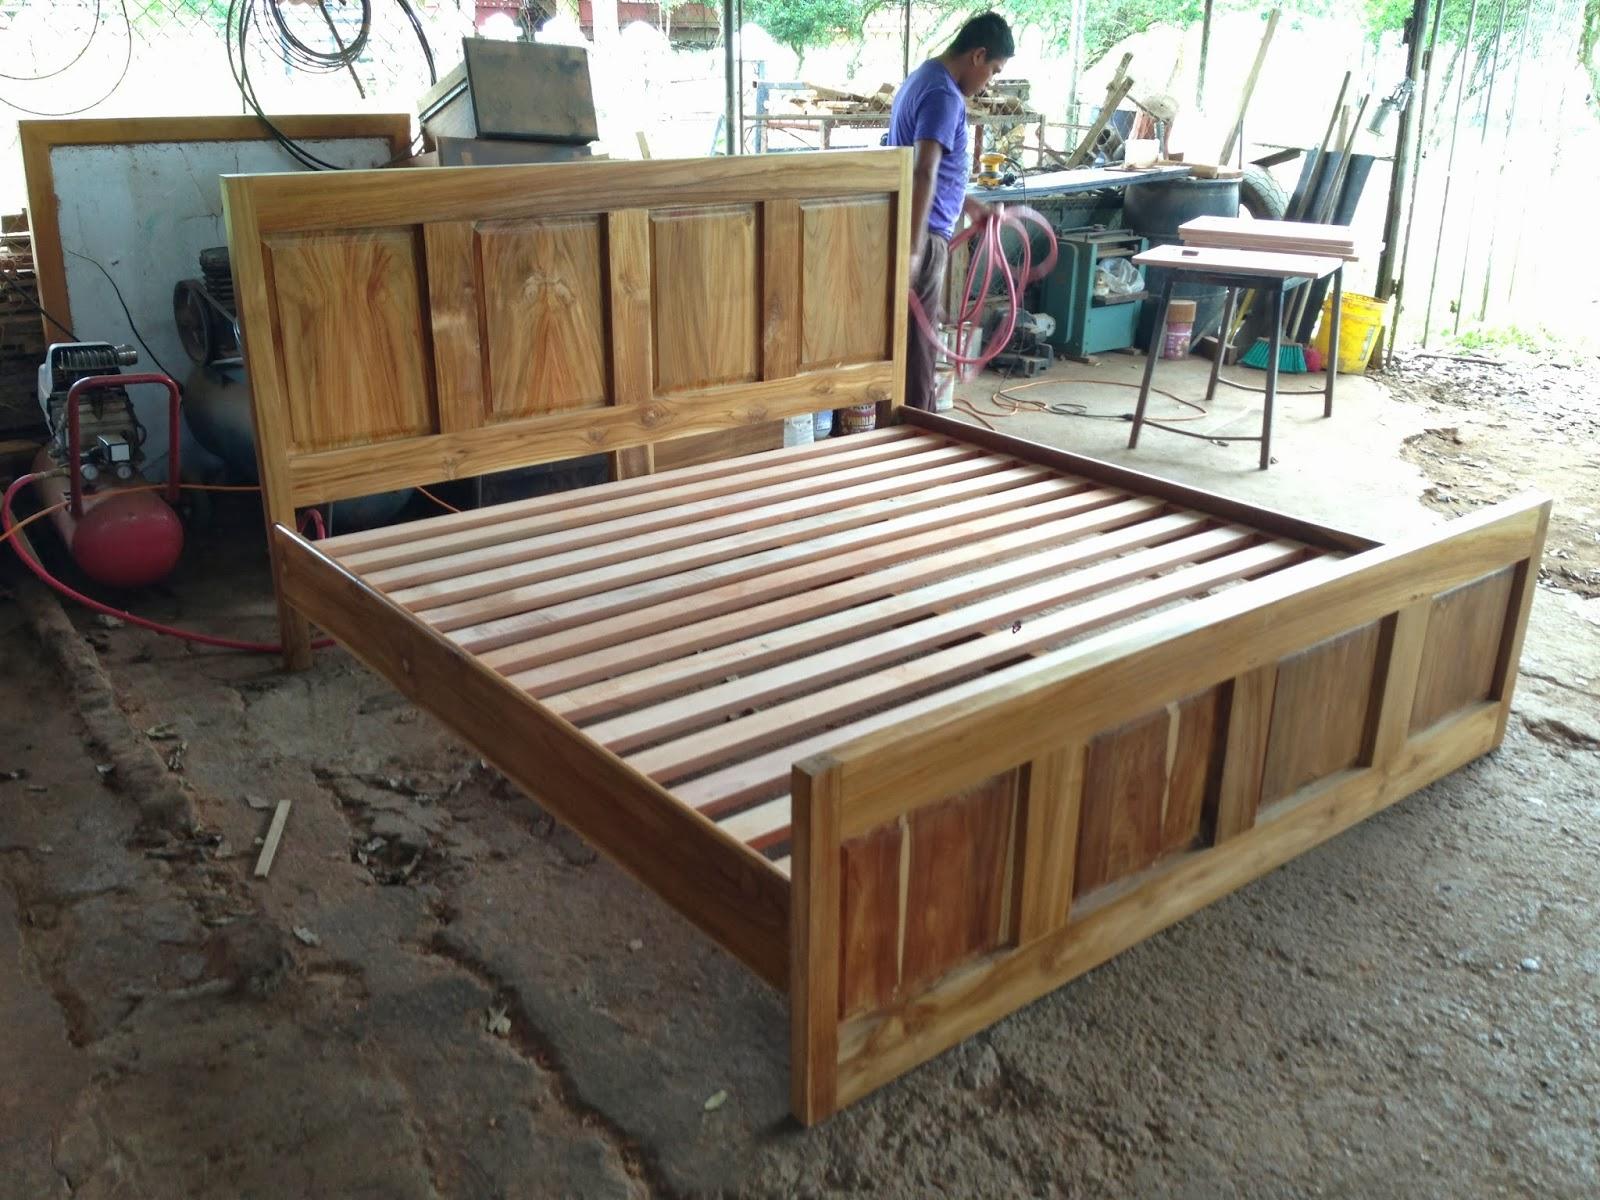 Grupo fung septiembre 2013 - Muebles de madera teca ...